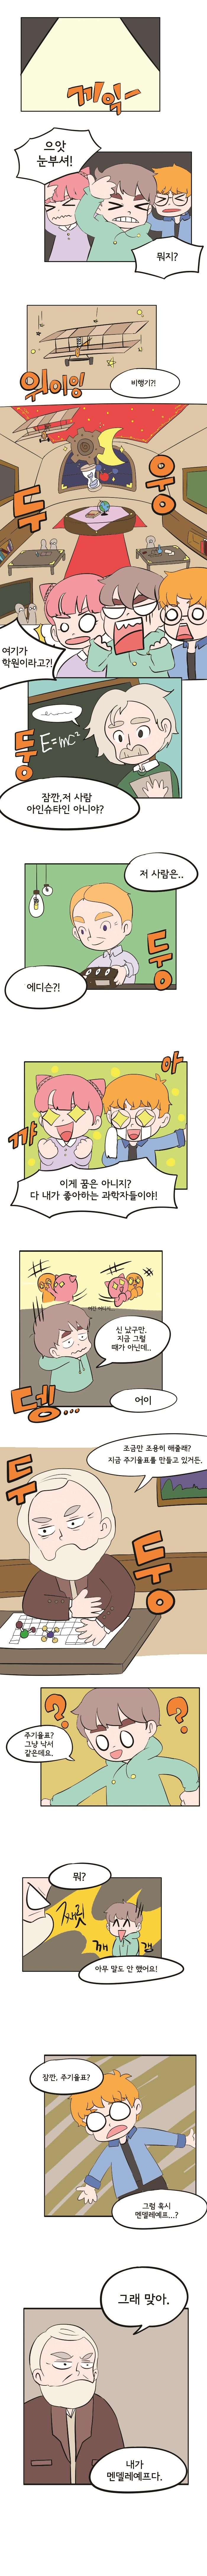 _CID_f_ju9plk3a0_CID_신비한과학학원3화-웹툰-최지원-20190410